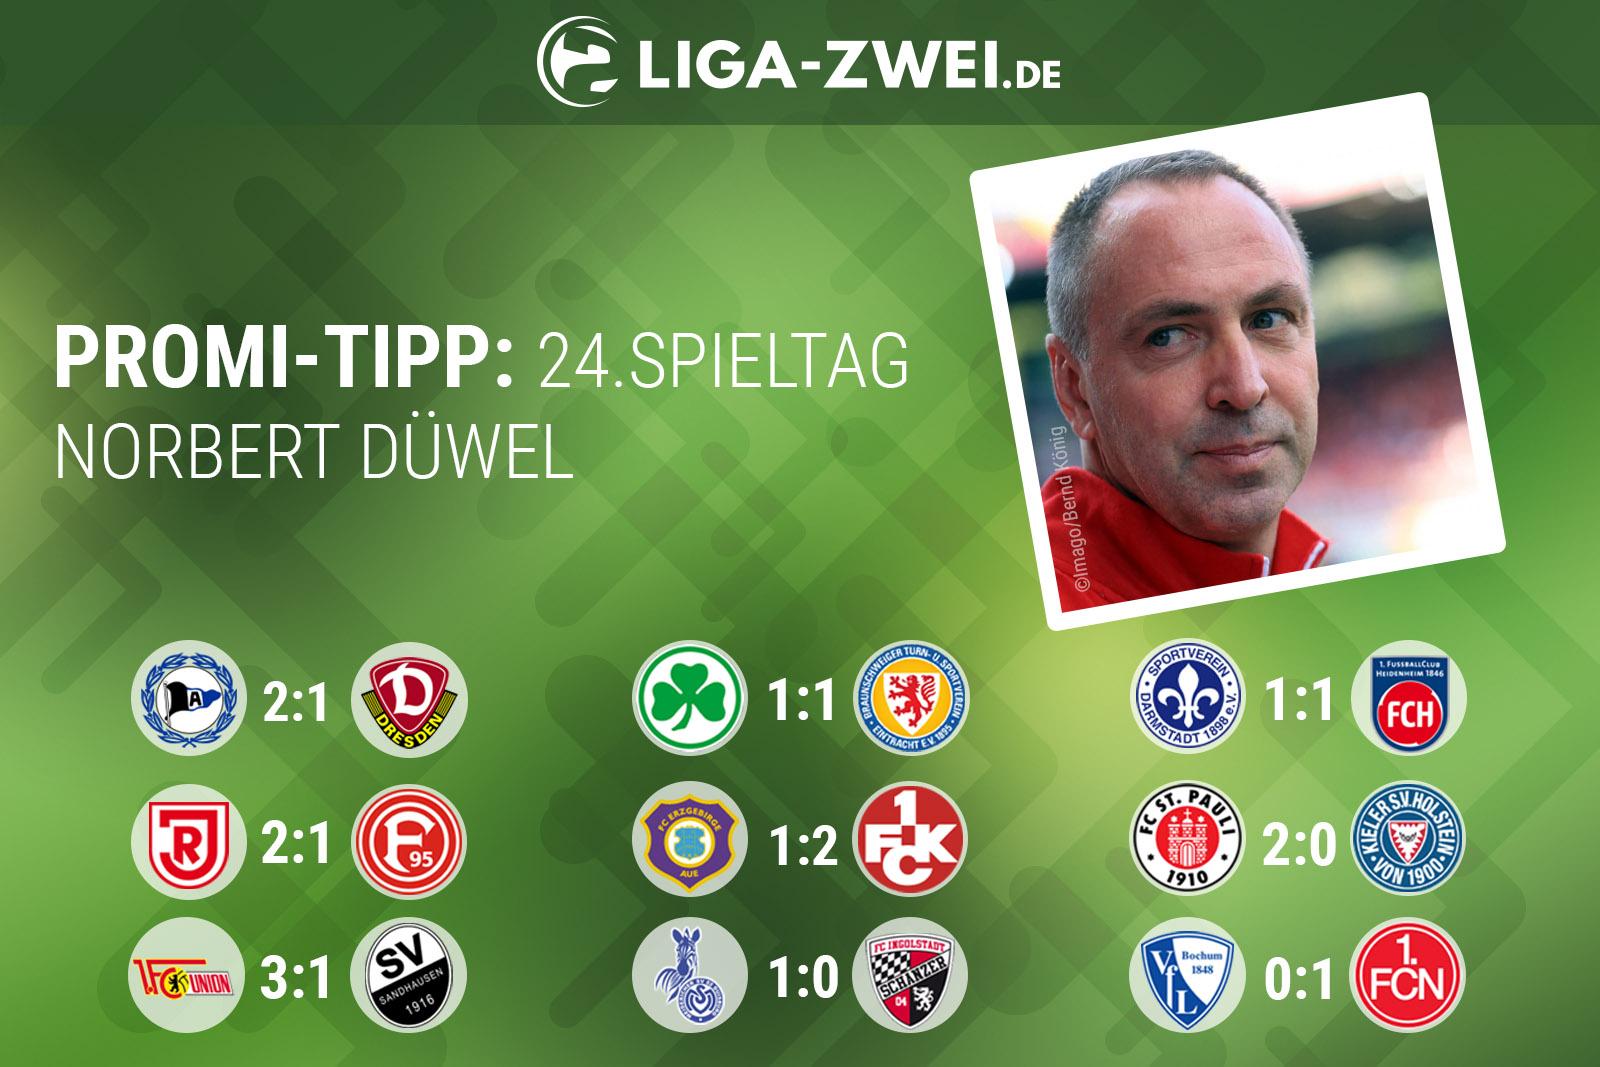 Nobert Düwel tippt den 24. Spieltag der 2. Bundesliga